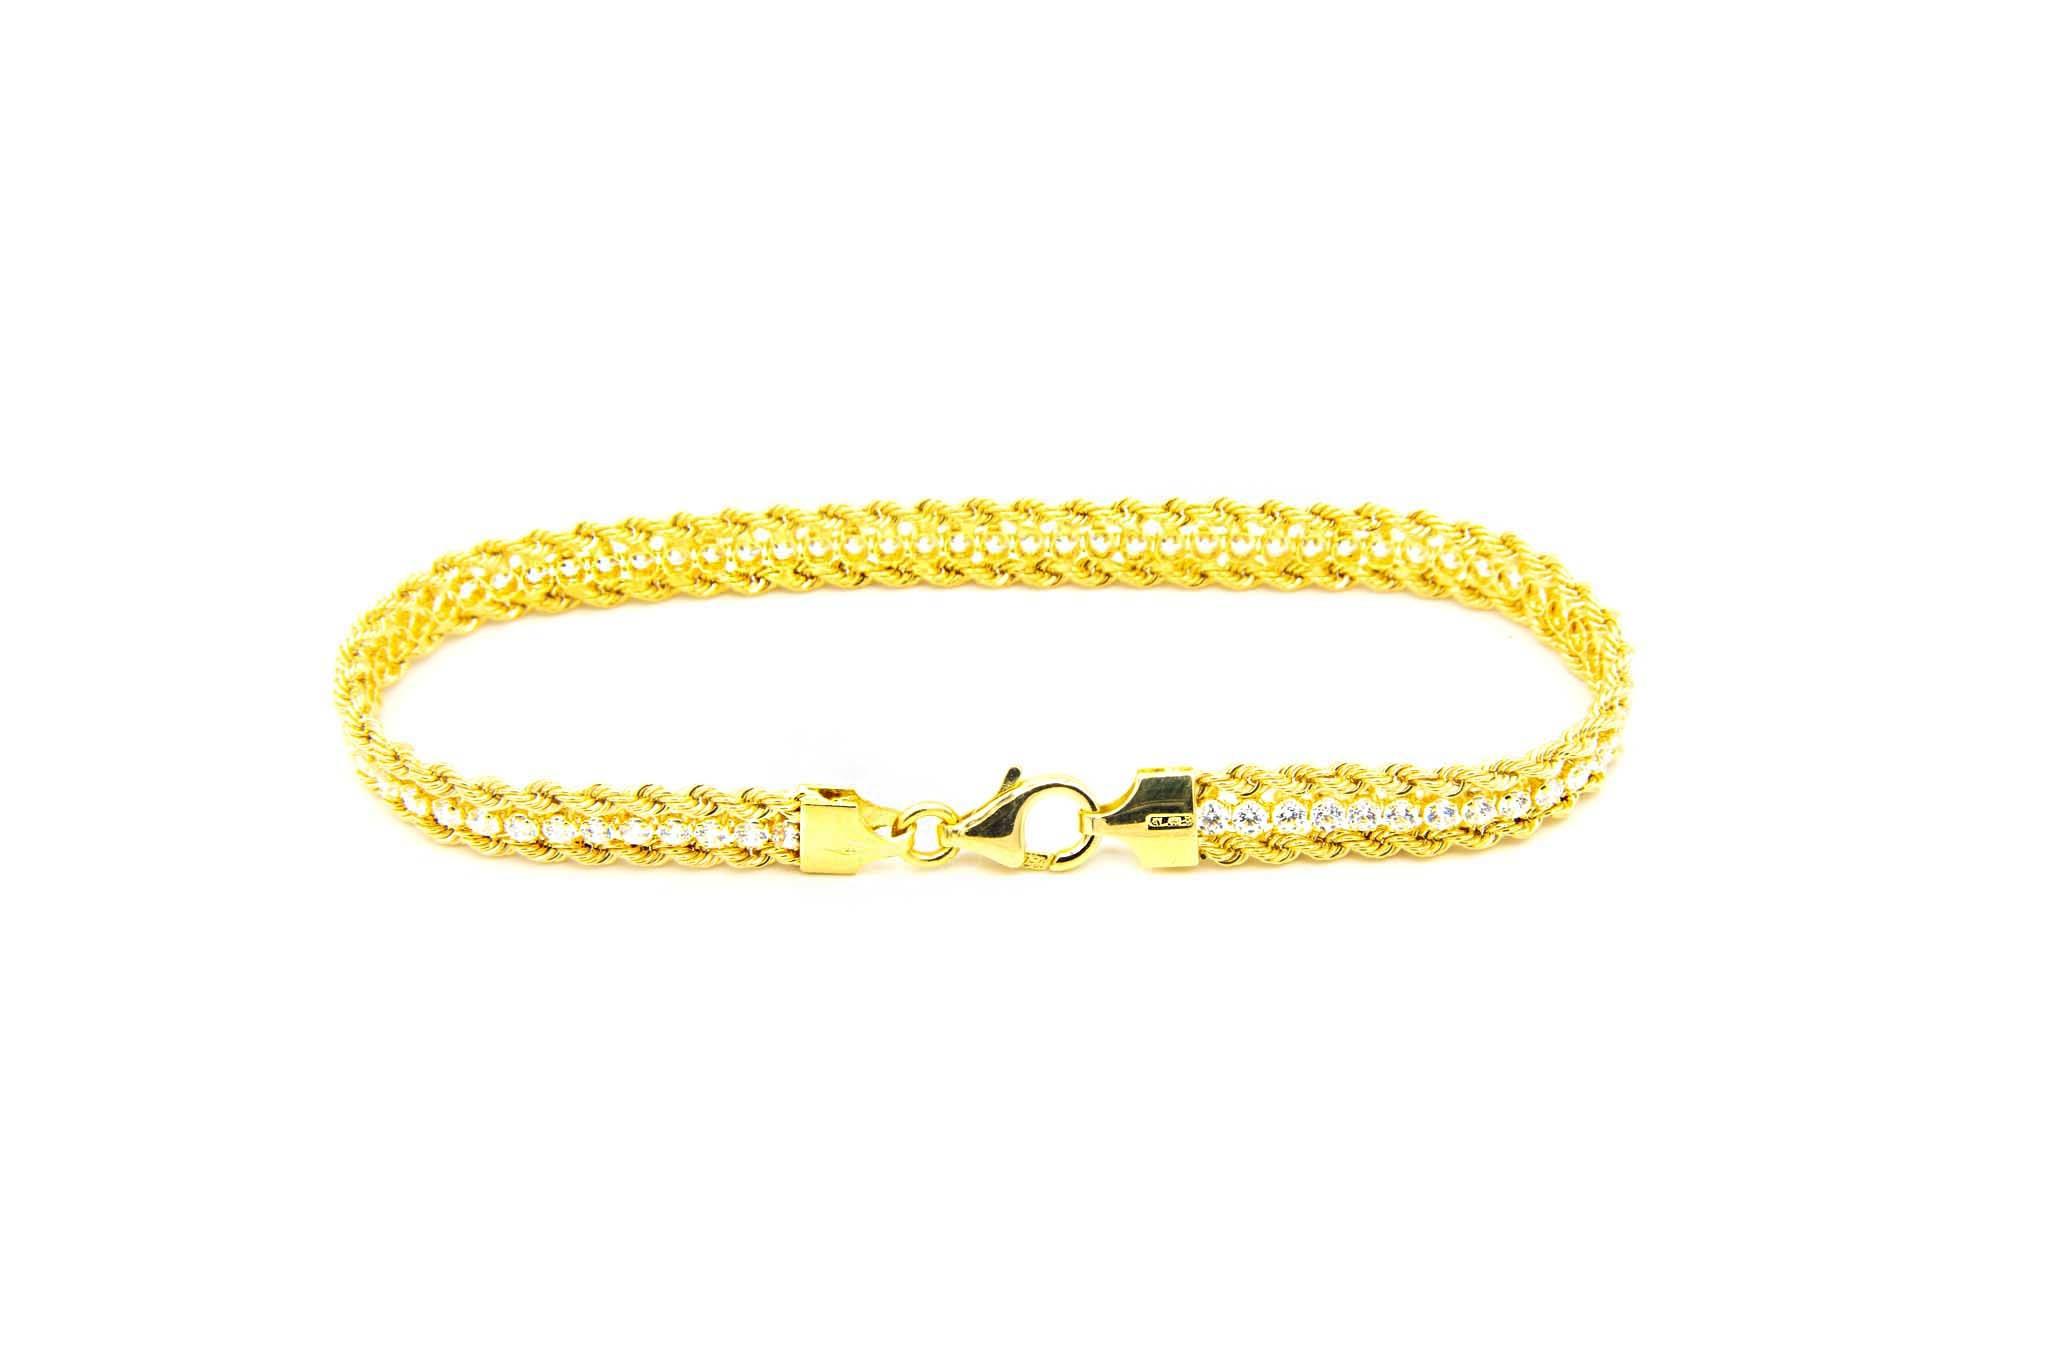 Armband dubbele rope chain met zirkonia's ertussen-3